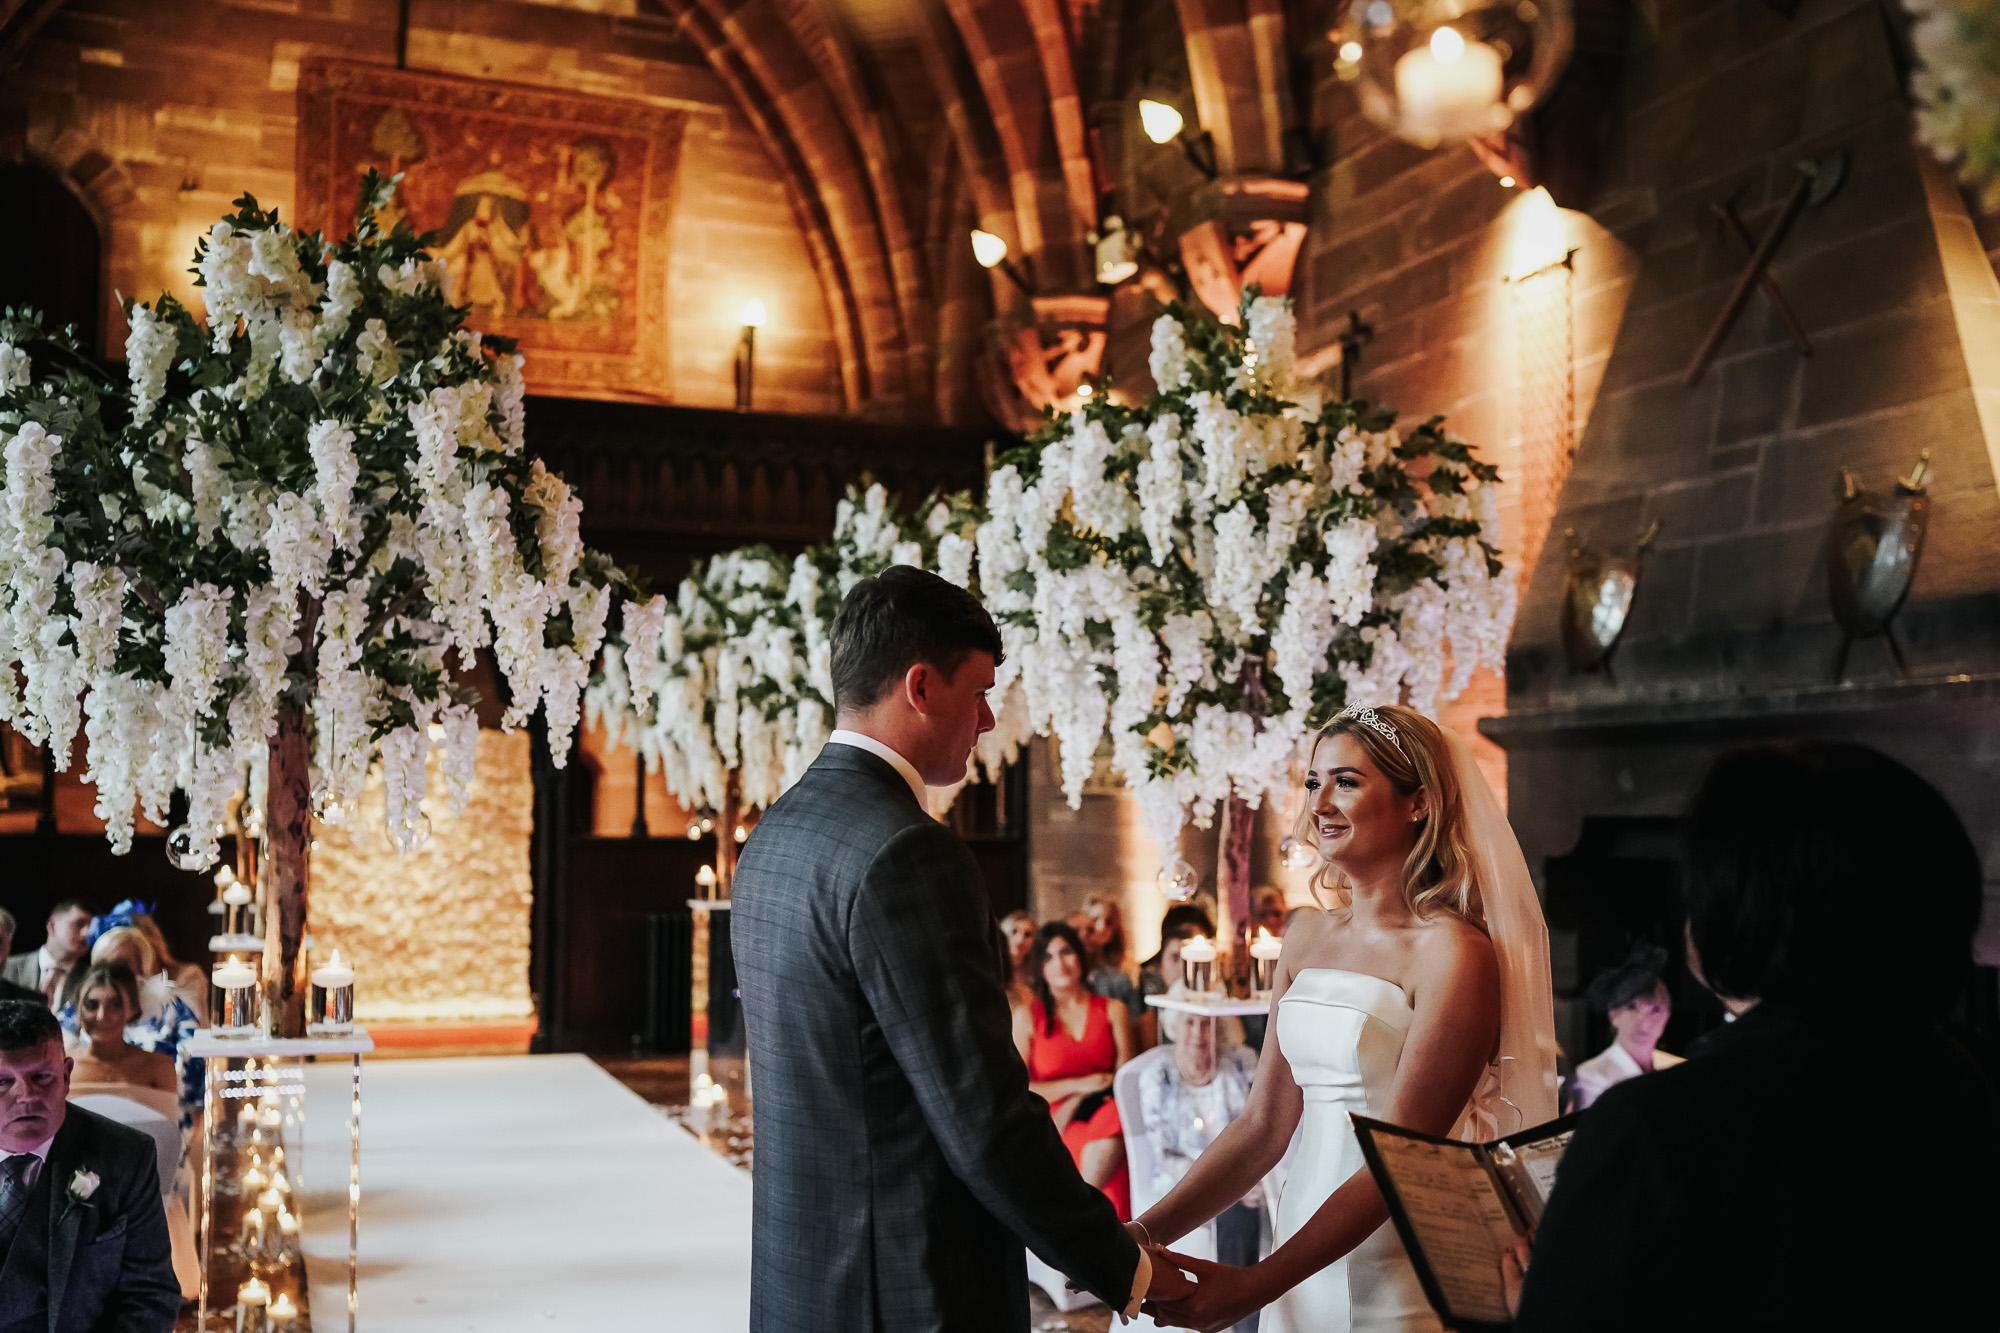 Peckforton Castle wedding photography cheshire wedding photographer (22 of 57).jpg